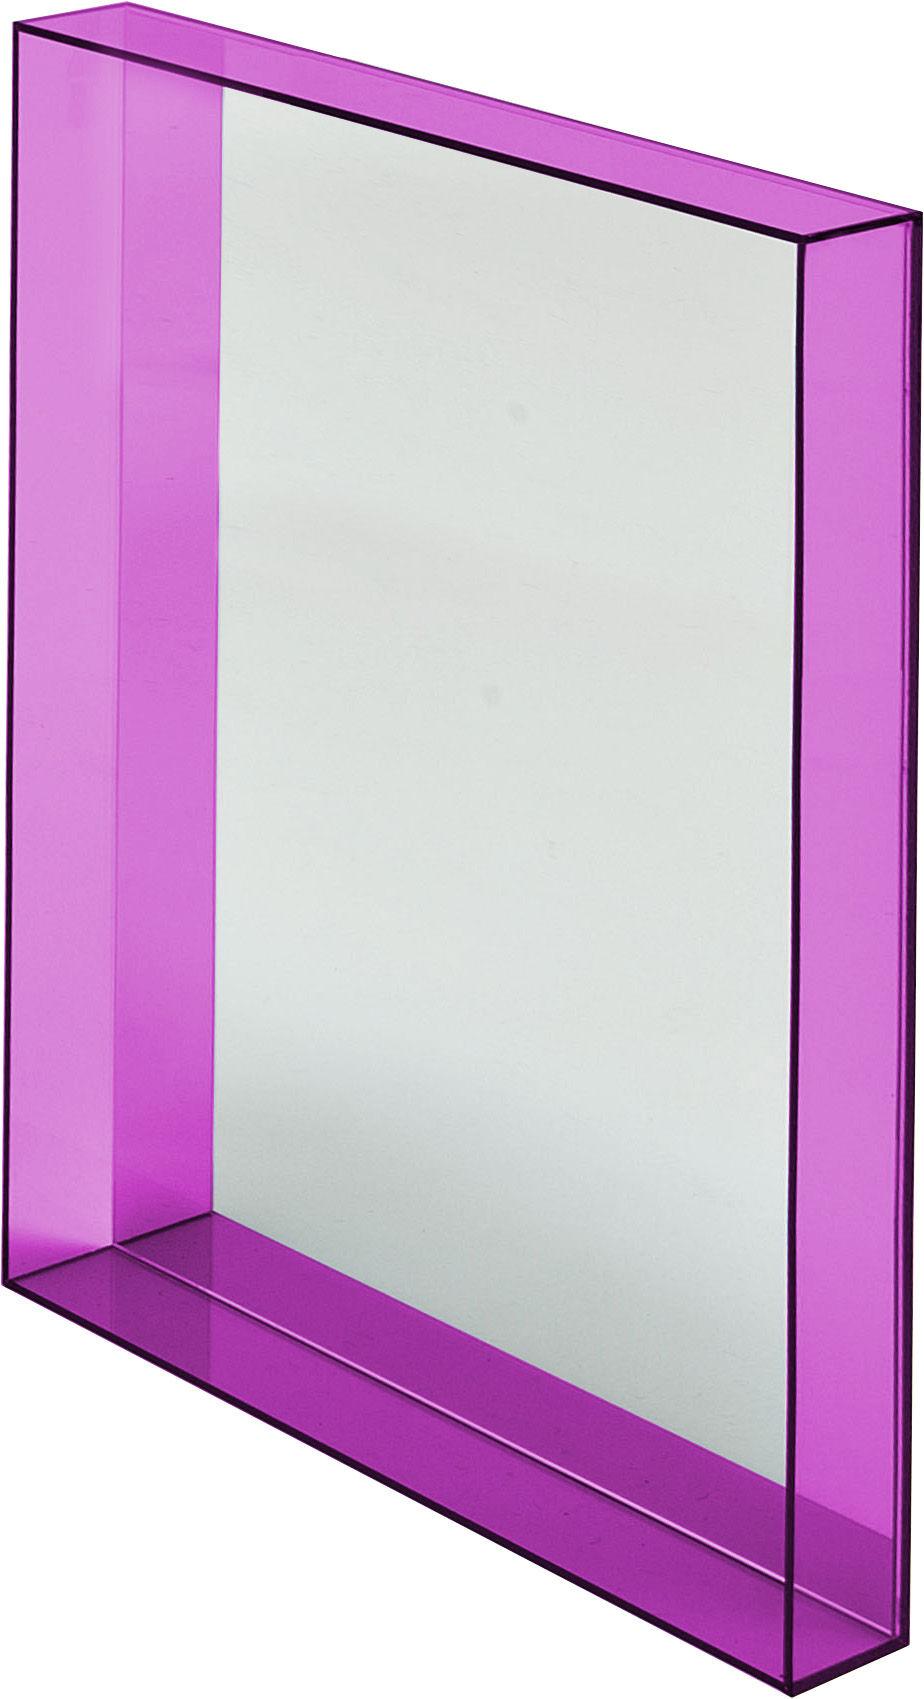 Miroir only me l 50 x h 70 cm fuchsia transparent kartell for Miroir 50 70